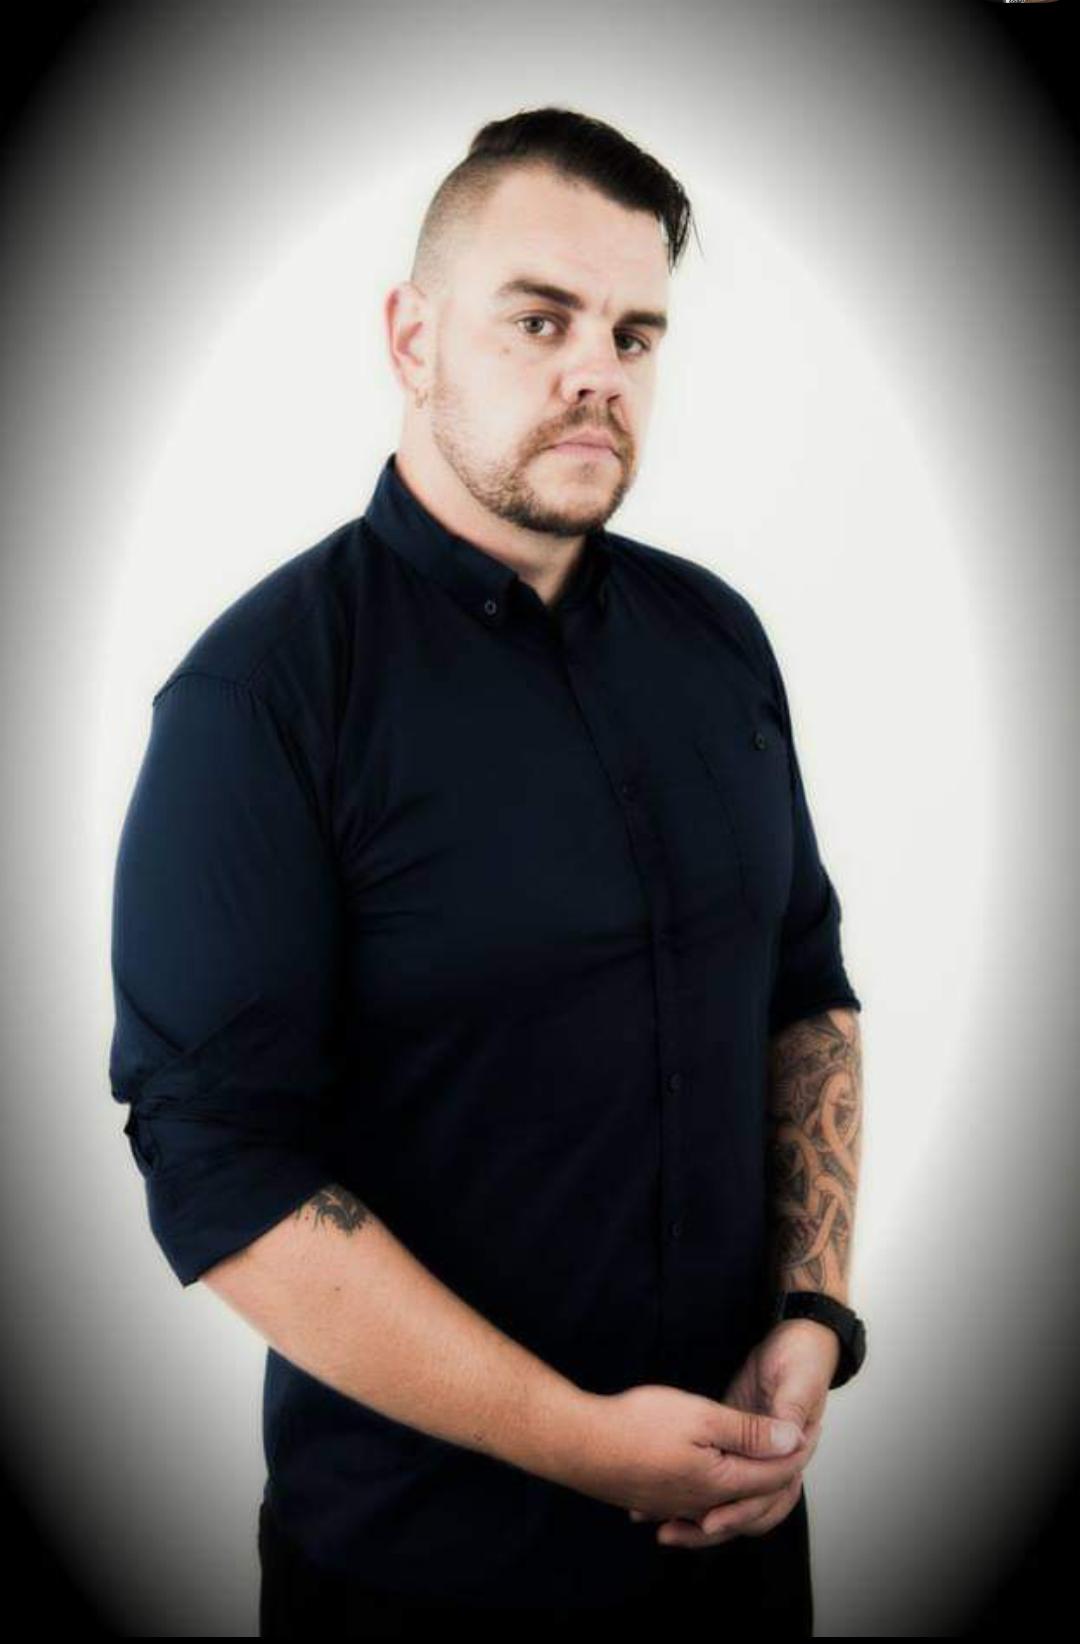 Sam - Gareth Craze (New Zealand)